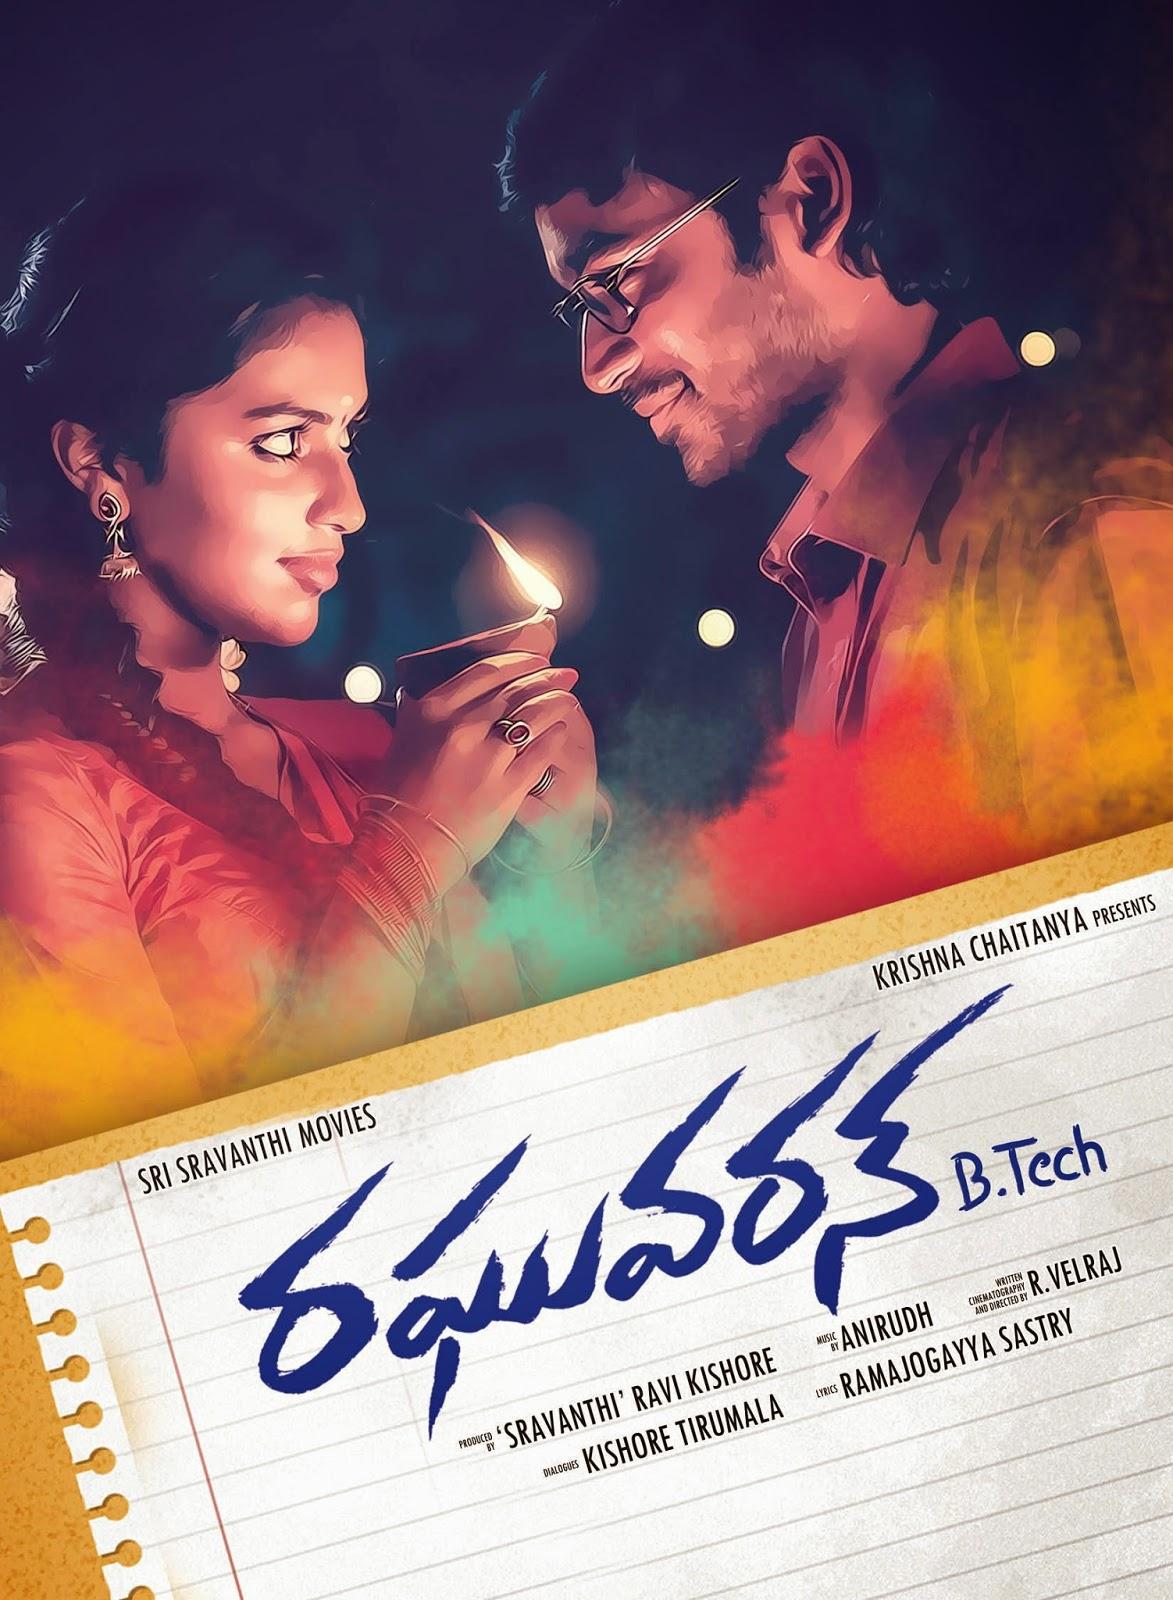 Raghuvaran b tech tamil movie : Fort bragg ca movies